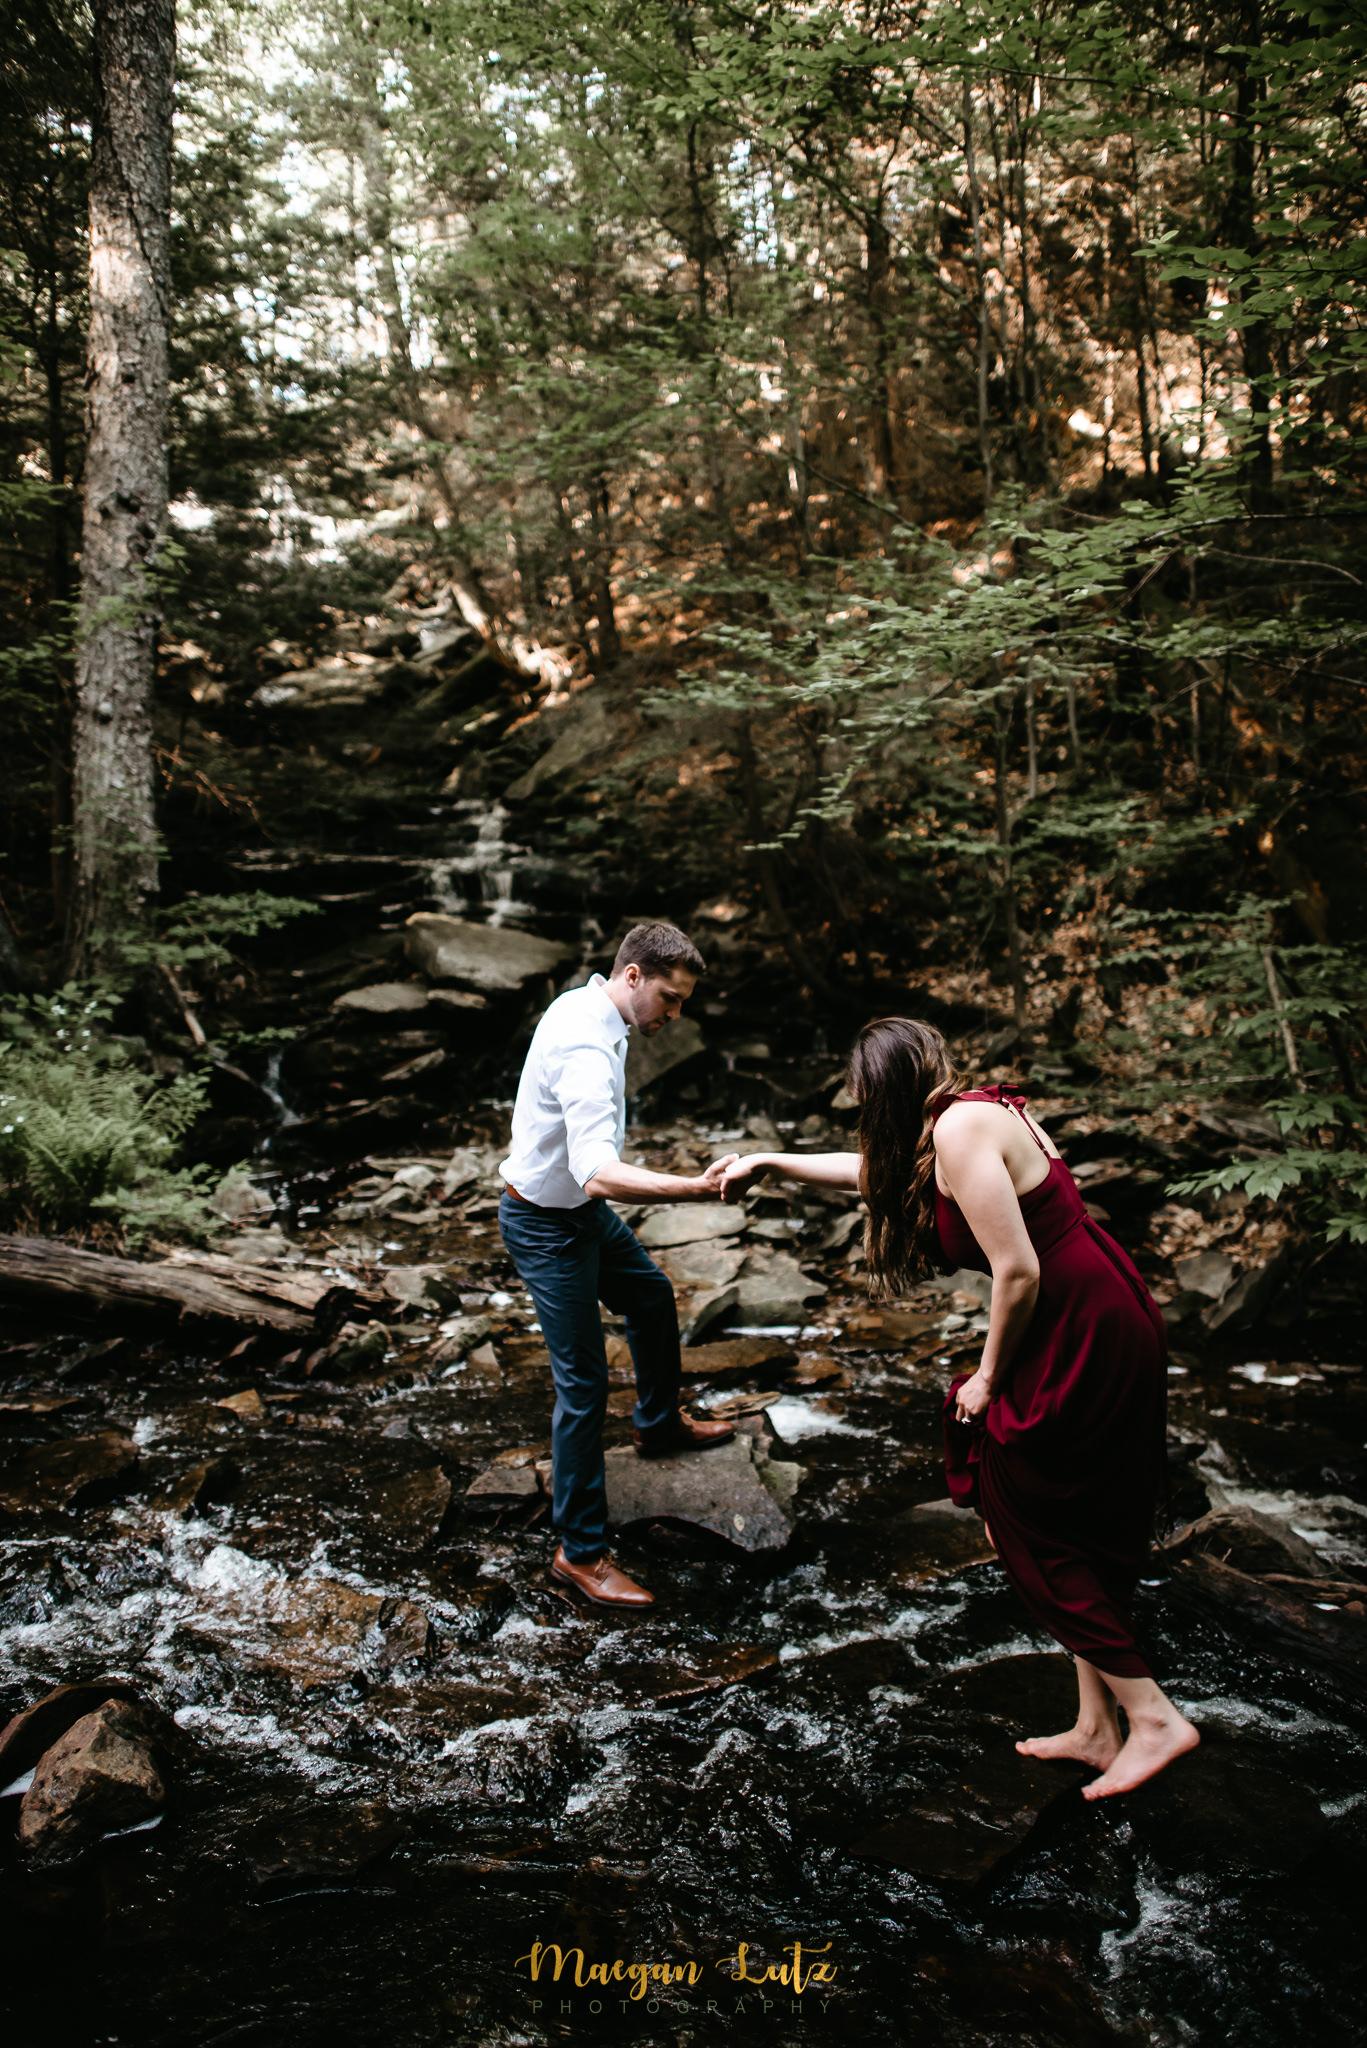 NEPA-Engagement-Wedding-Photographer-Session-at-Ricketts-Glen-State-Park-9.jpg